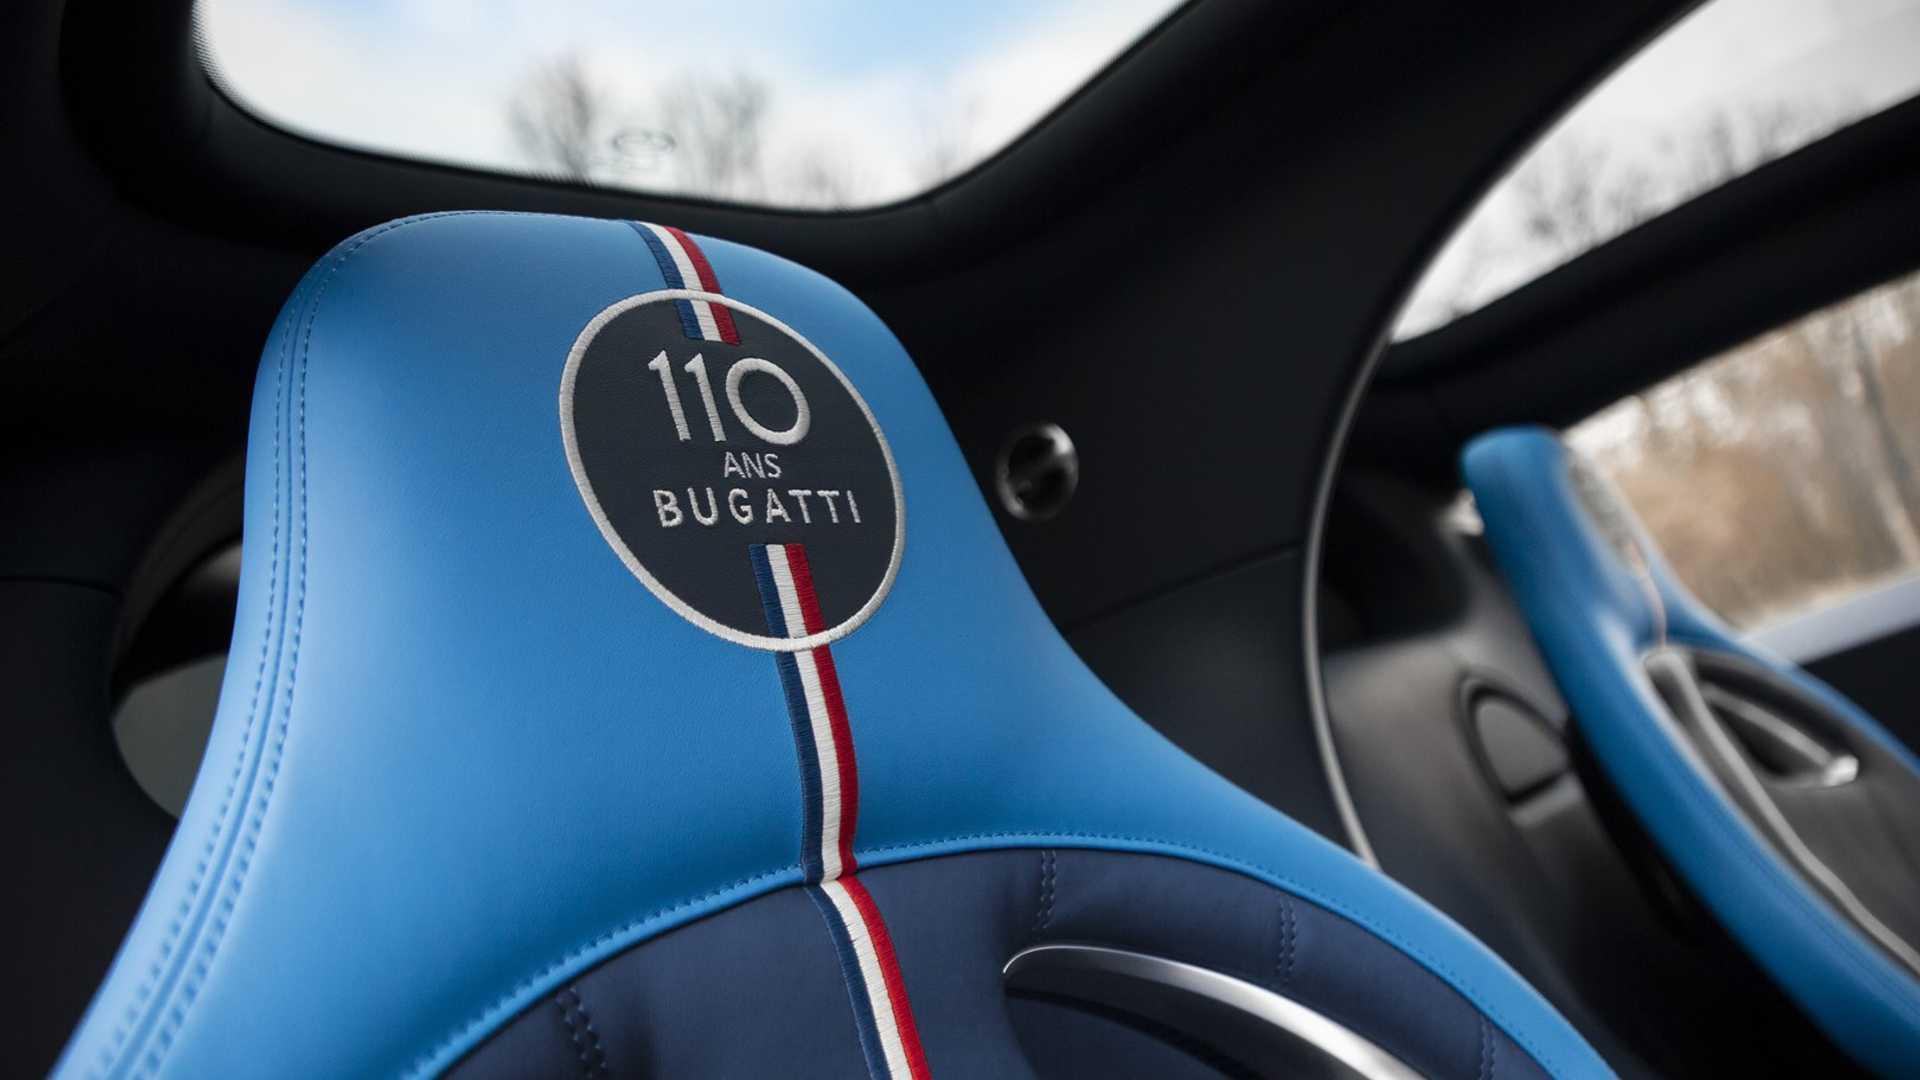 bugatti-chiron-sport-110-ans-bugatti (9)